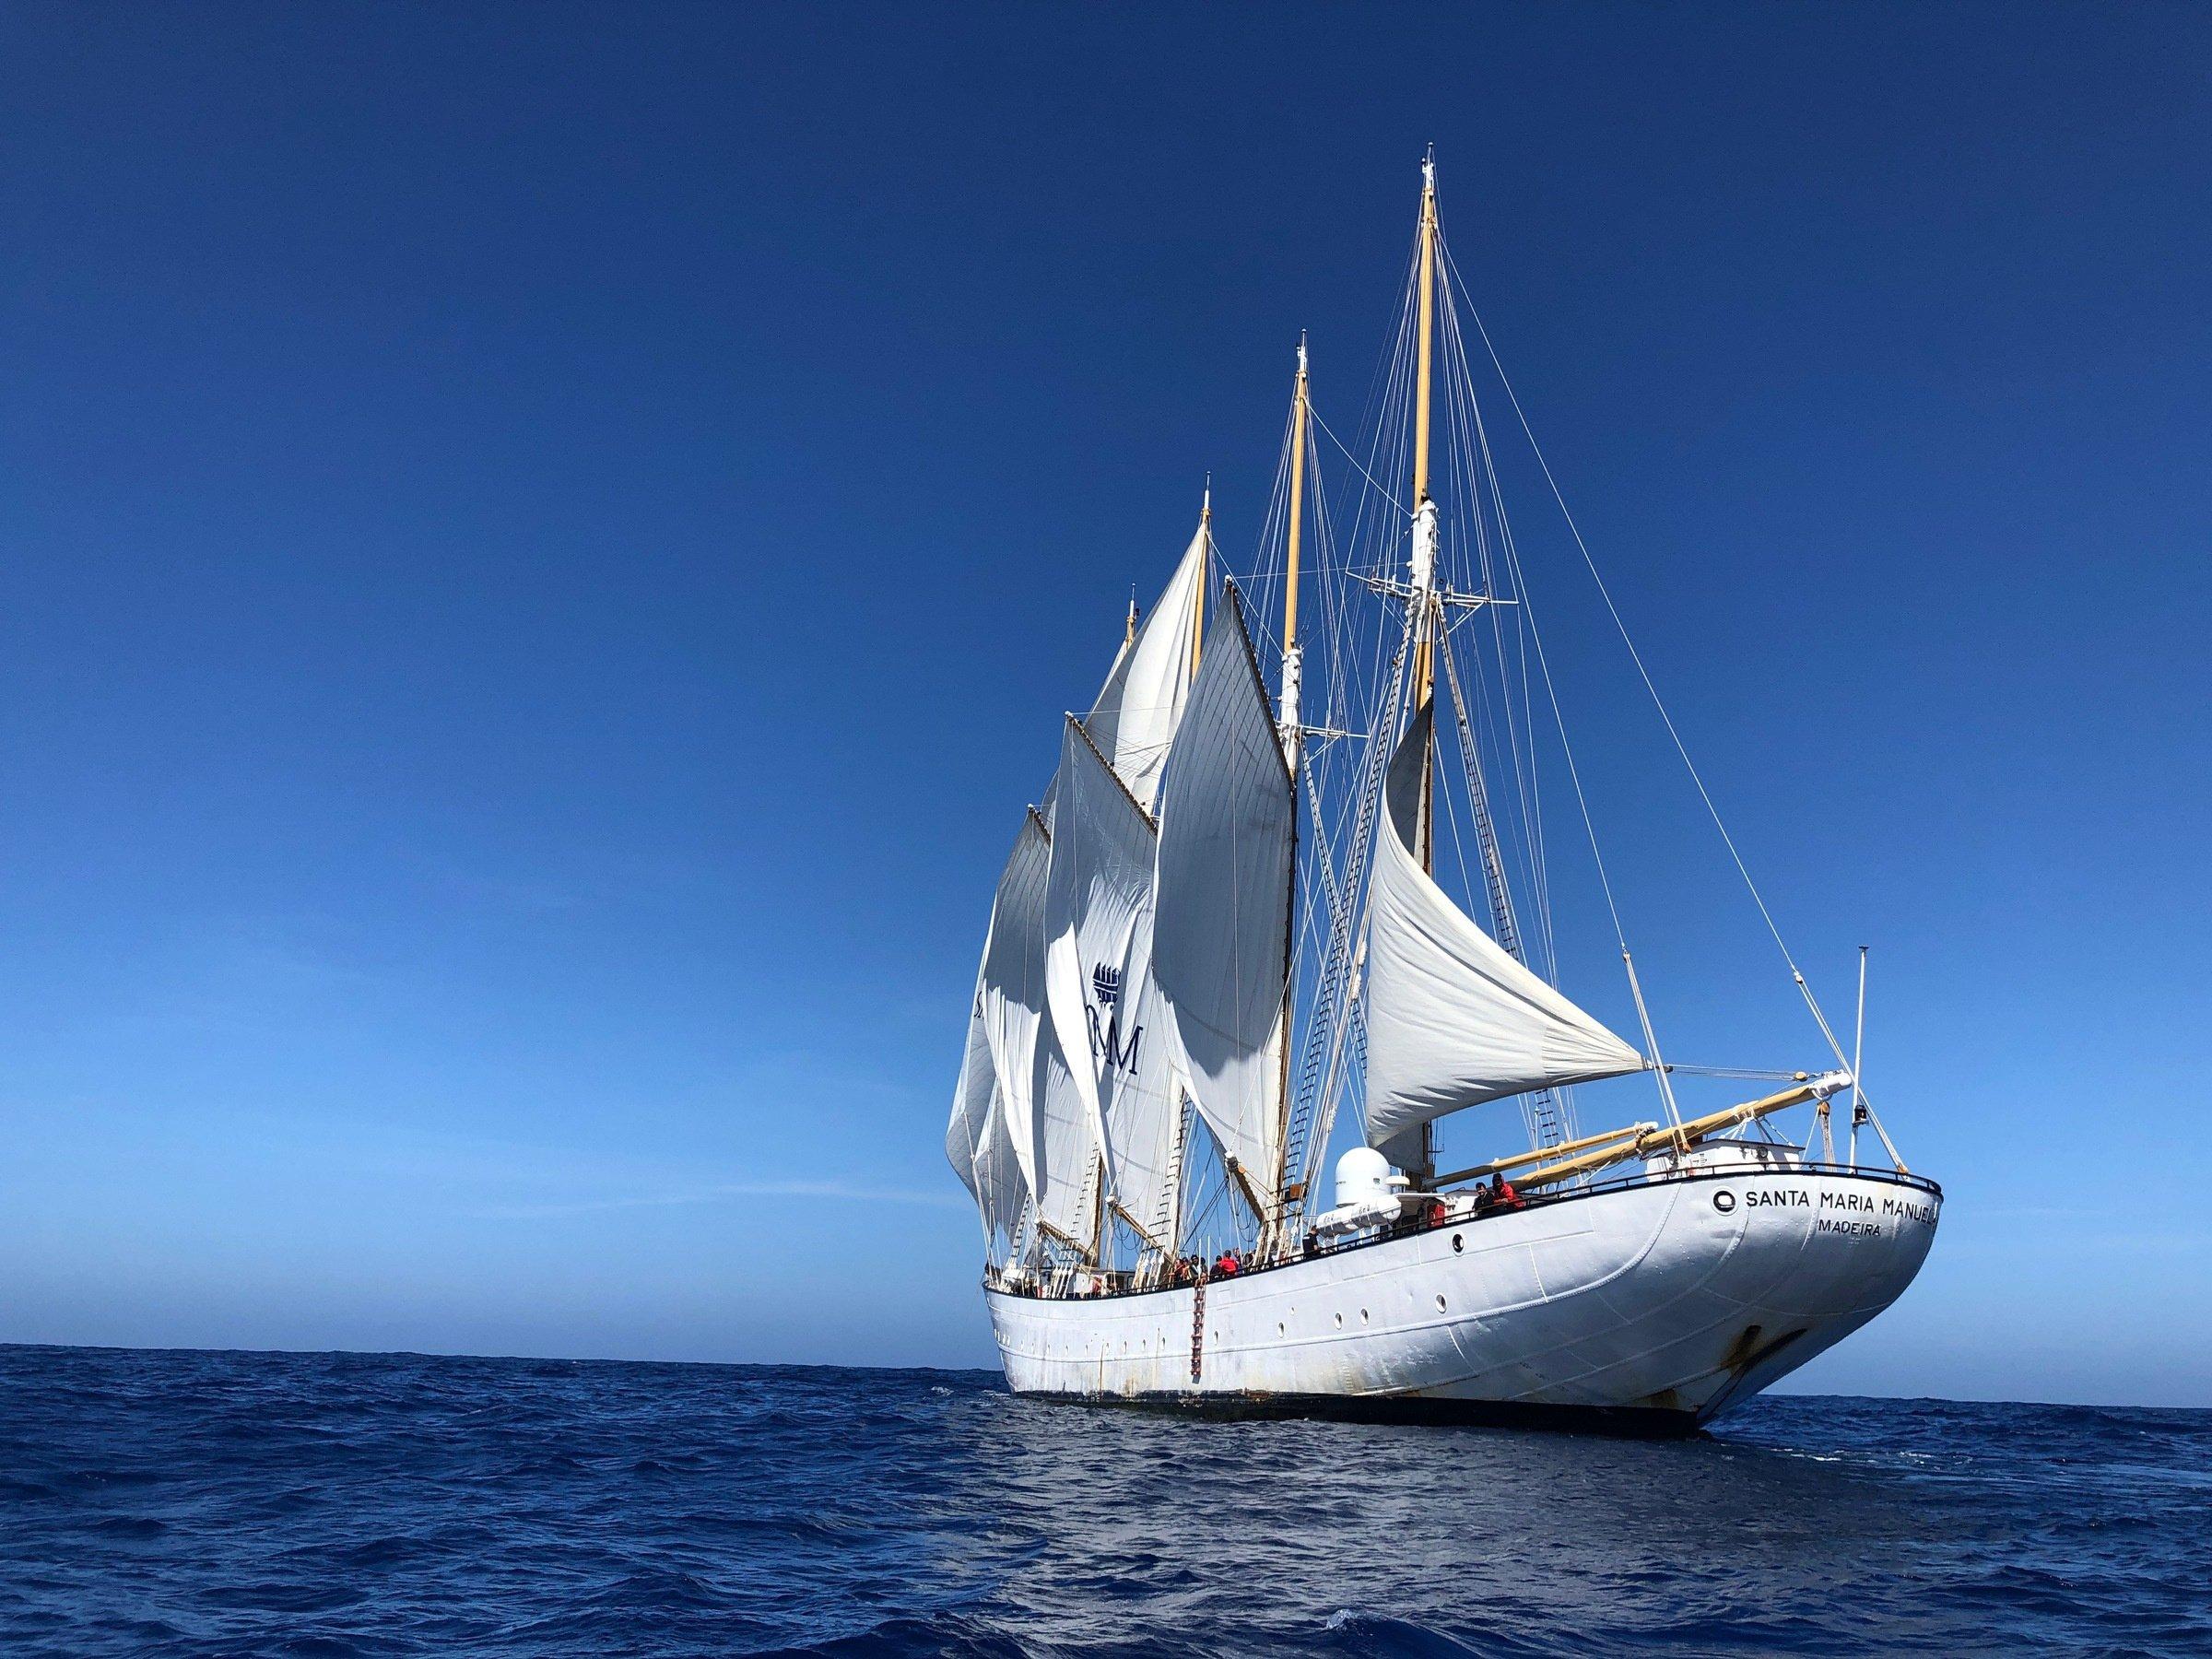 tall-ship-santa-maria-manuela